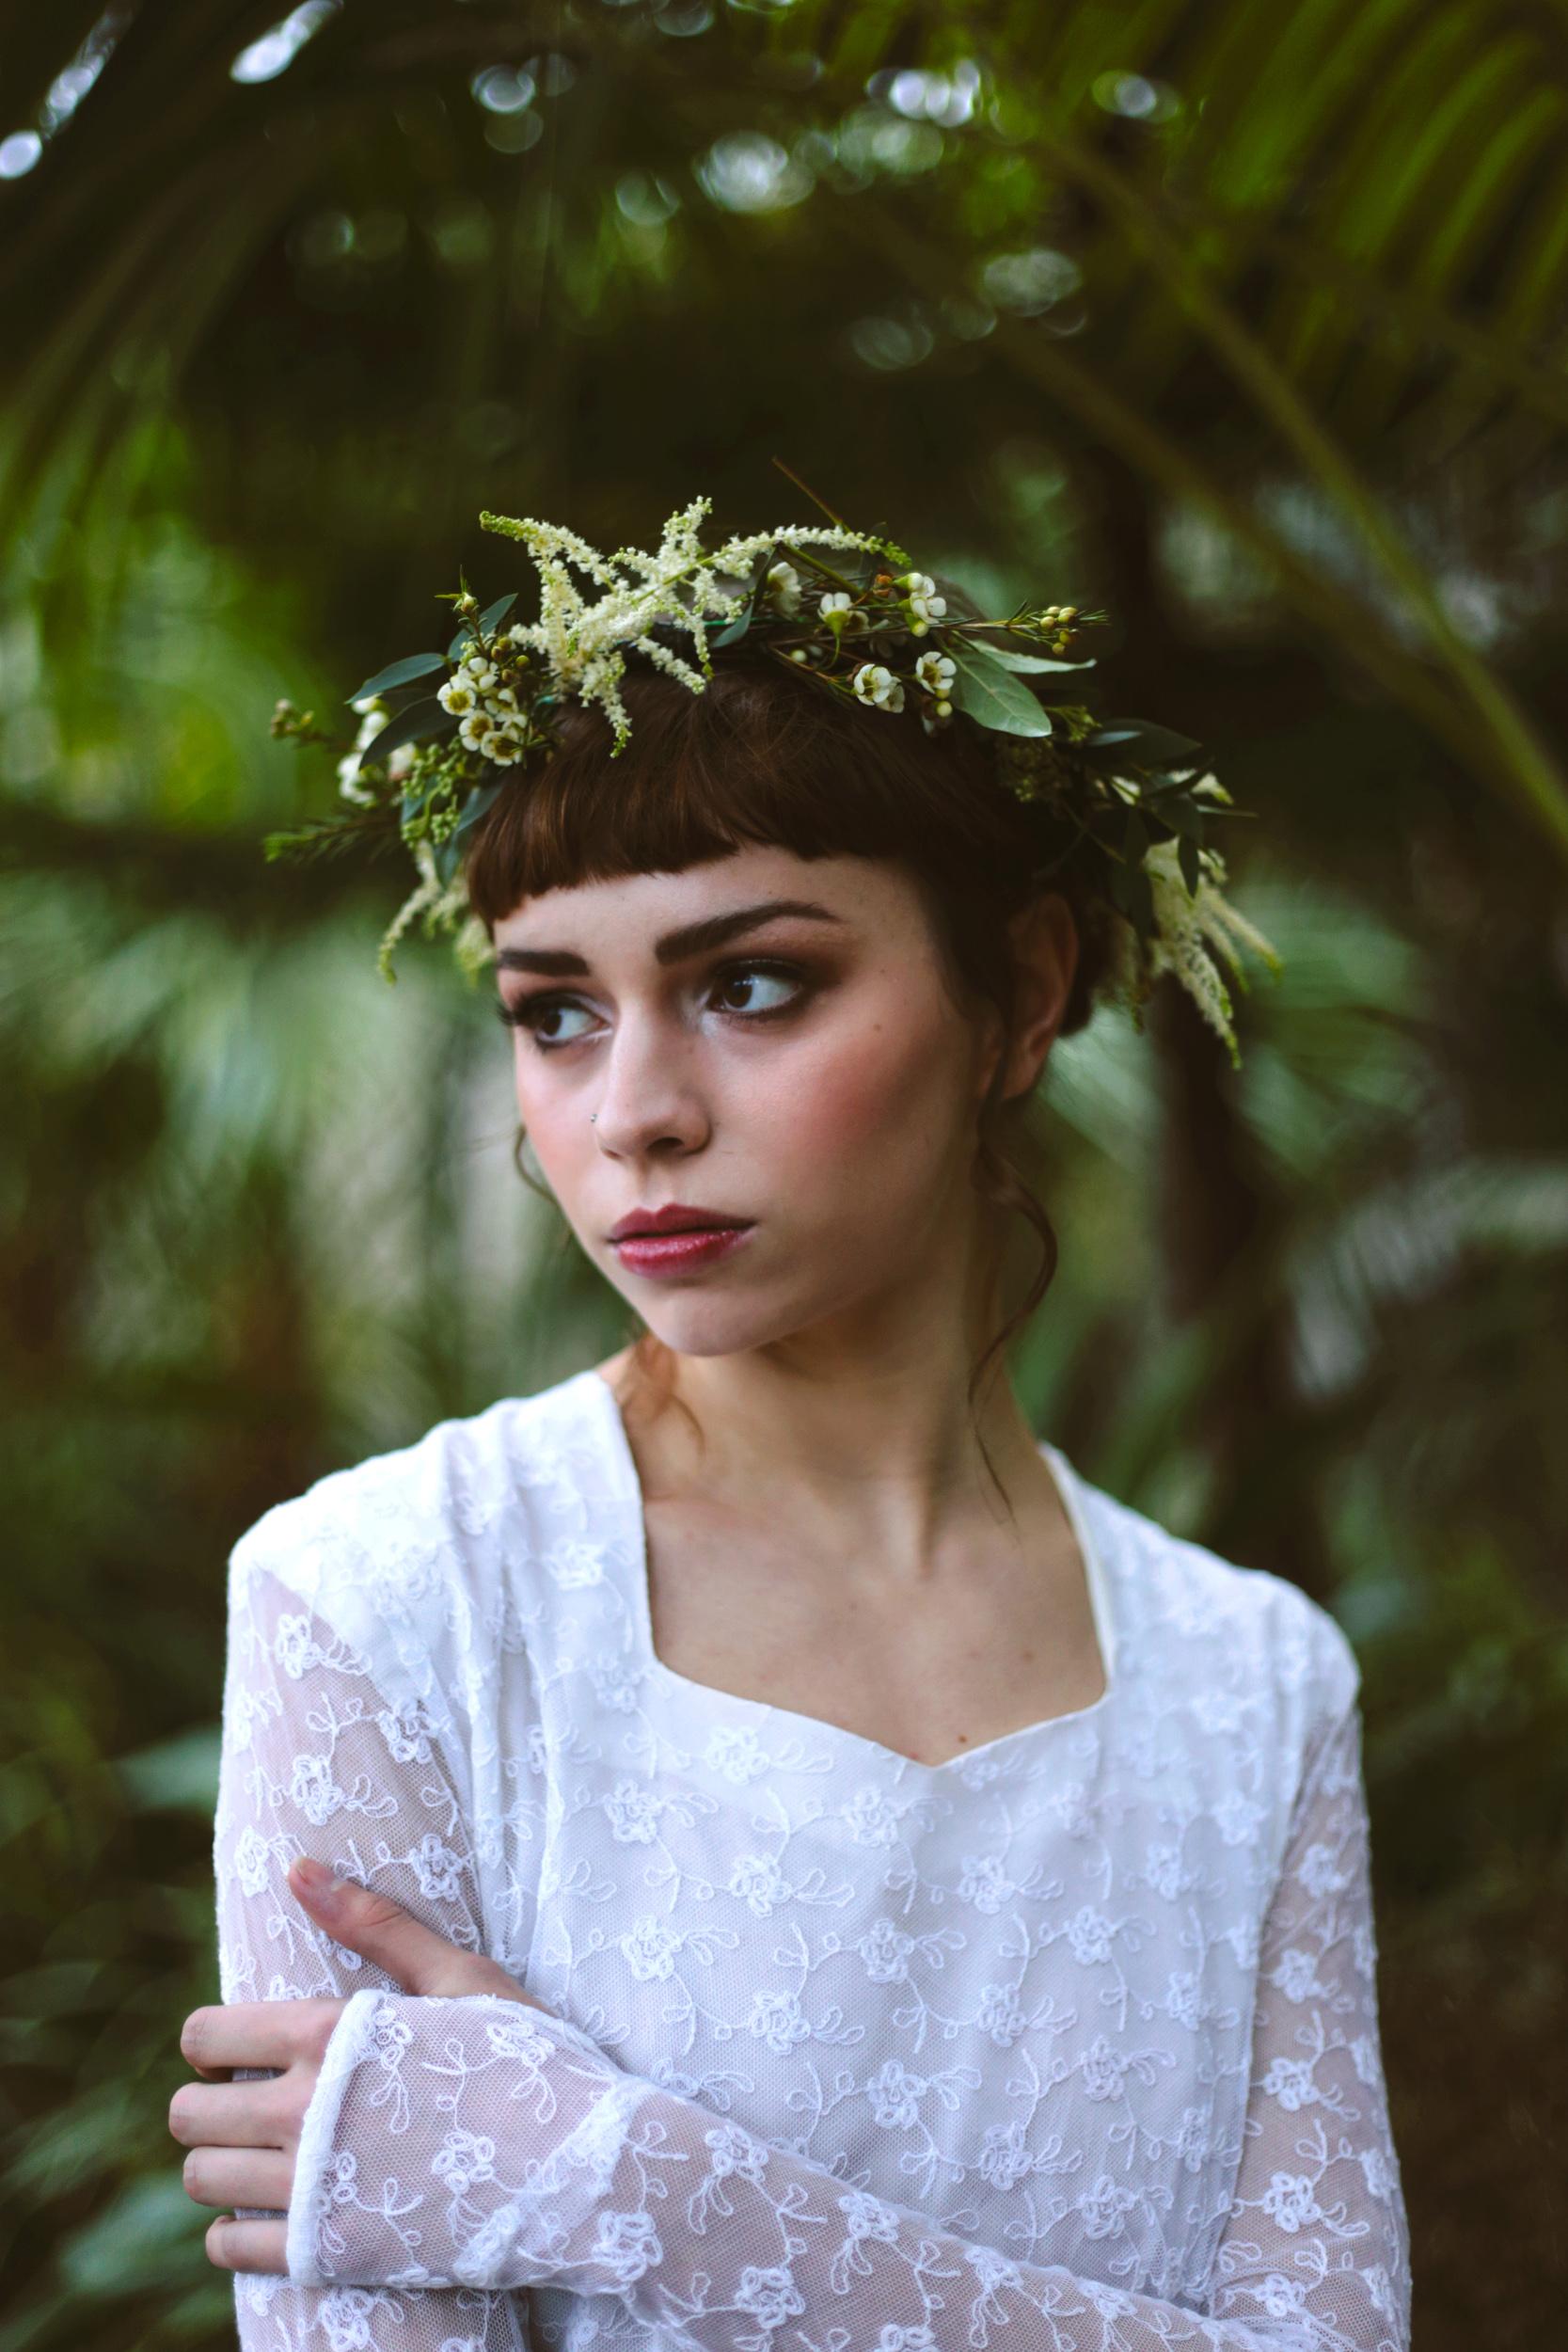 Winter-Bridal-Kate-Beaumont-Shelley-Richmond-Vintage-Wedding-Dress-20.jpg